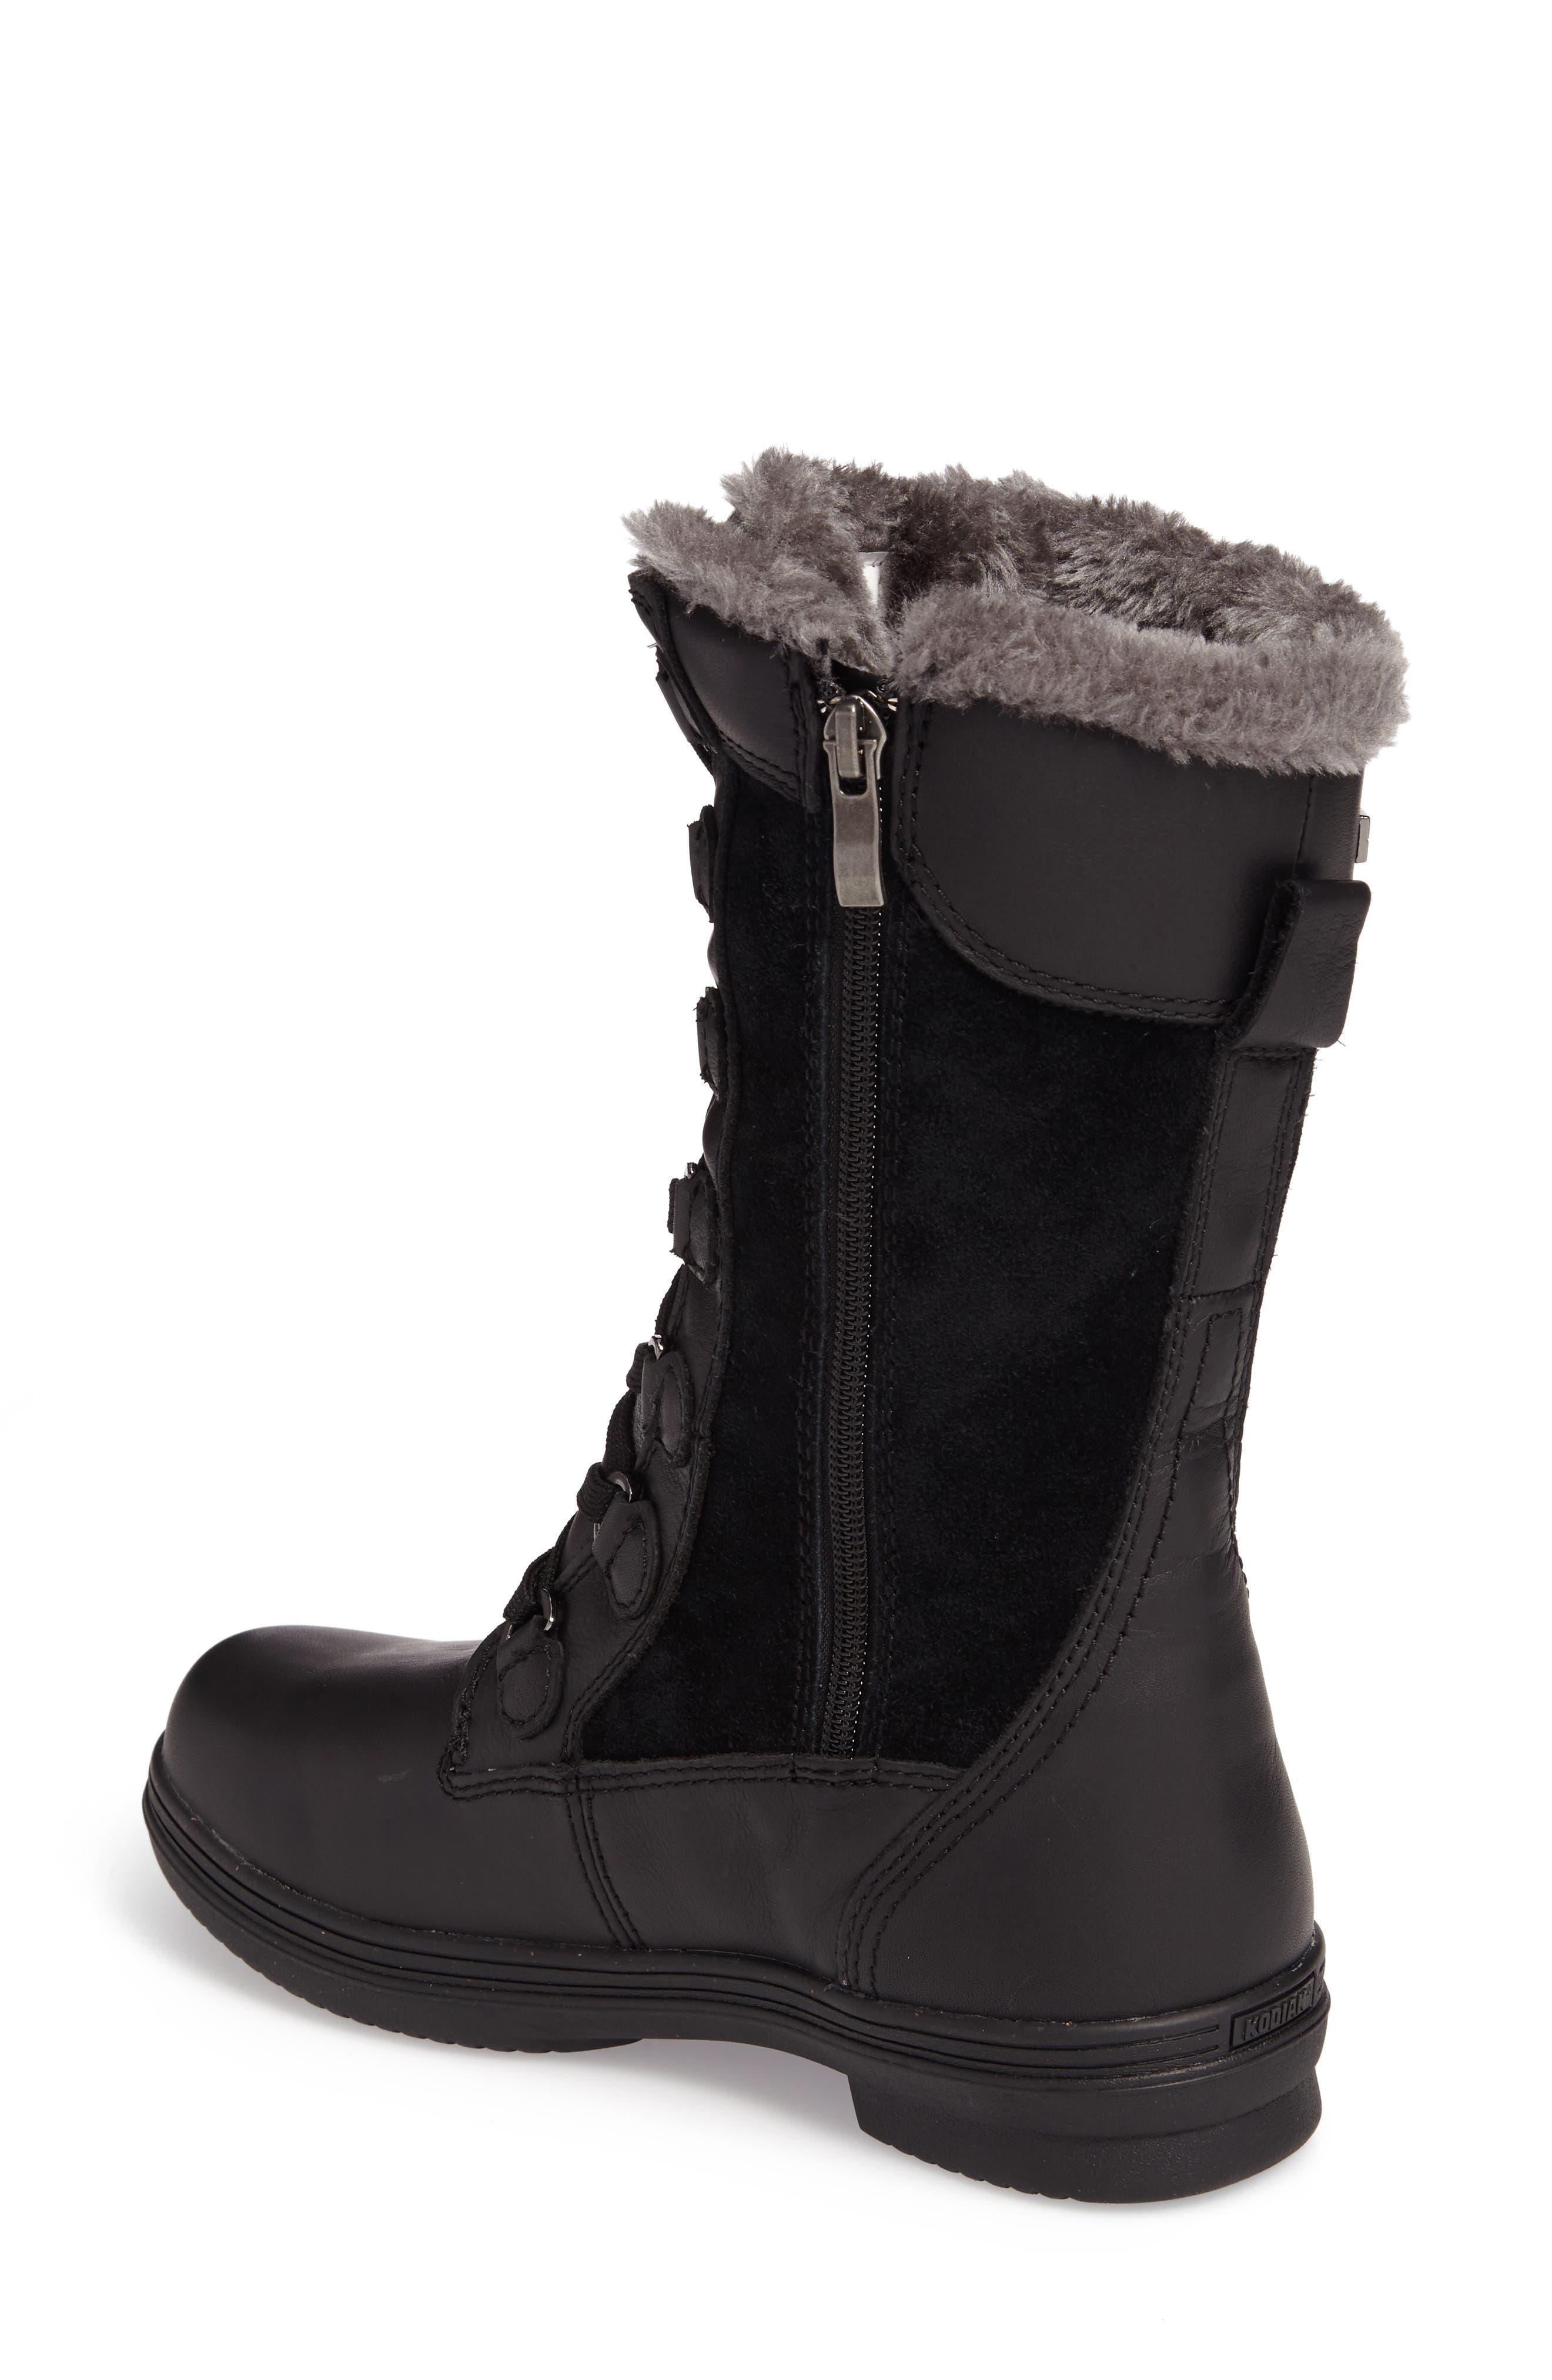 Glata Waterproof Boot,                             Alternate thumbnail 2, color,                             Black Leather